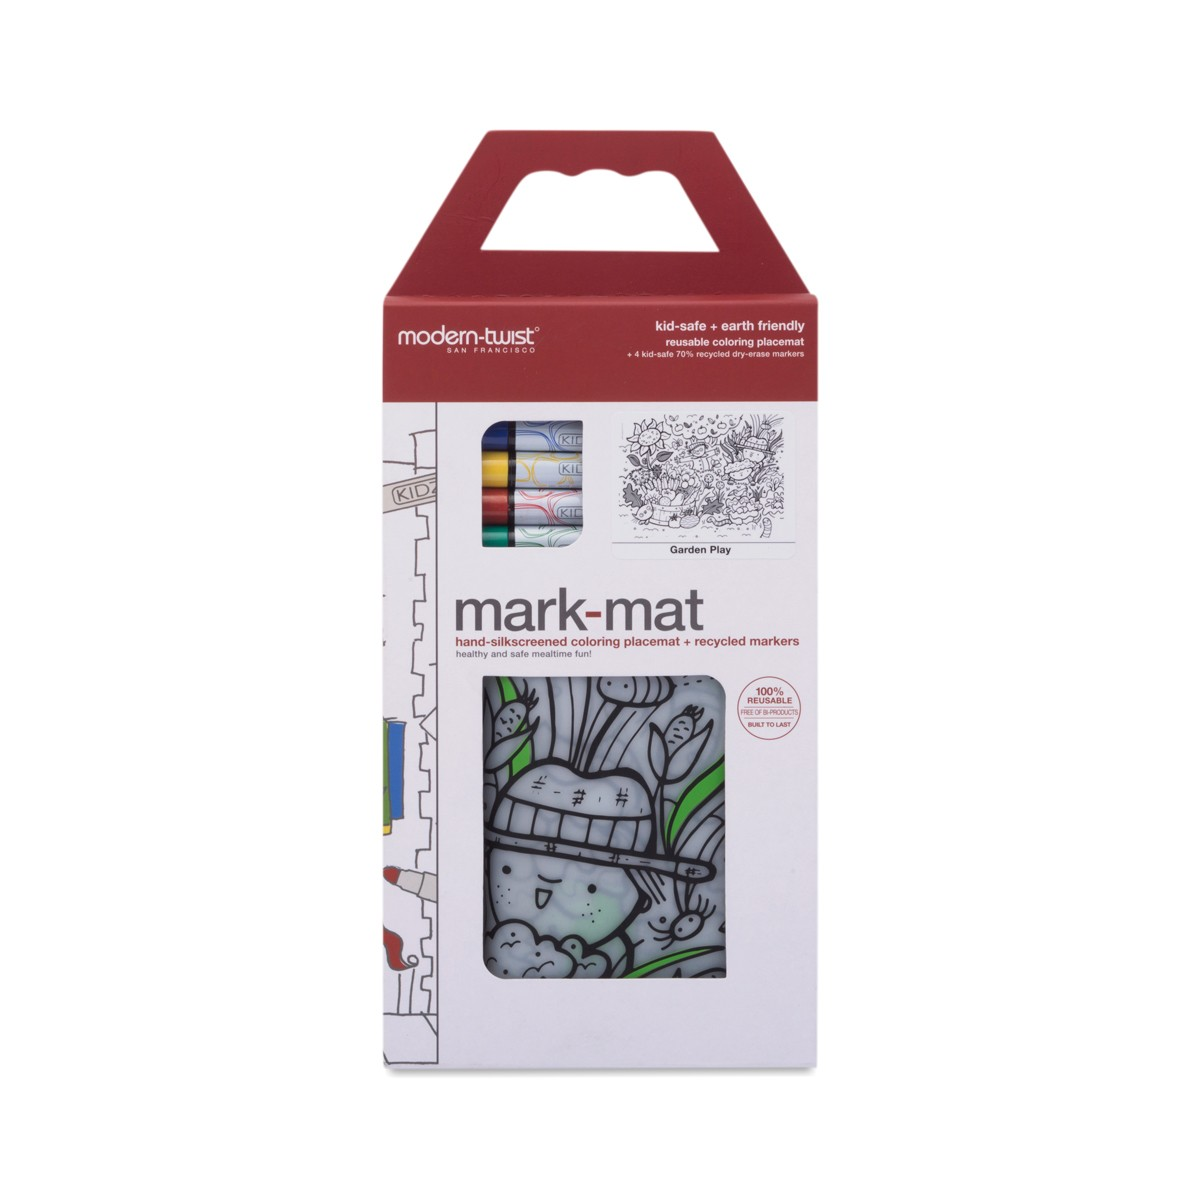 Garden Play Mark Mat 4 Markers By Modern Twist Thrive